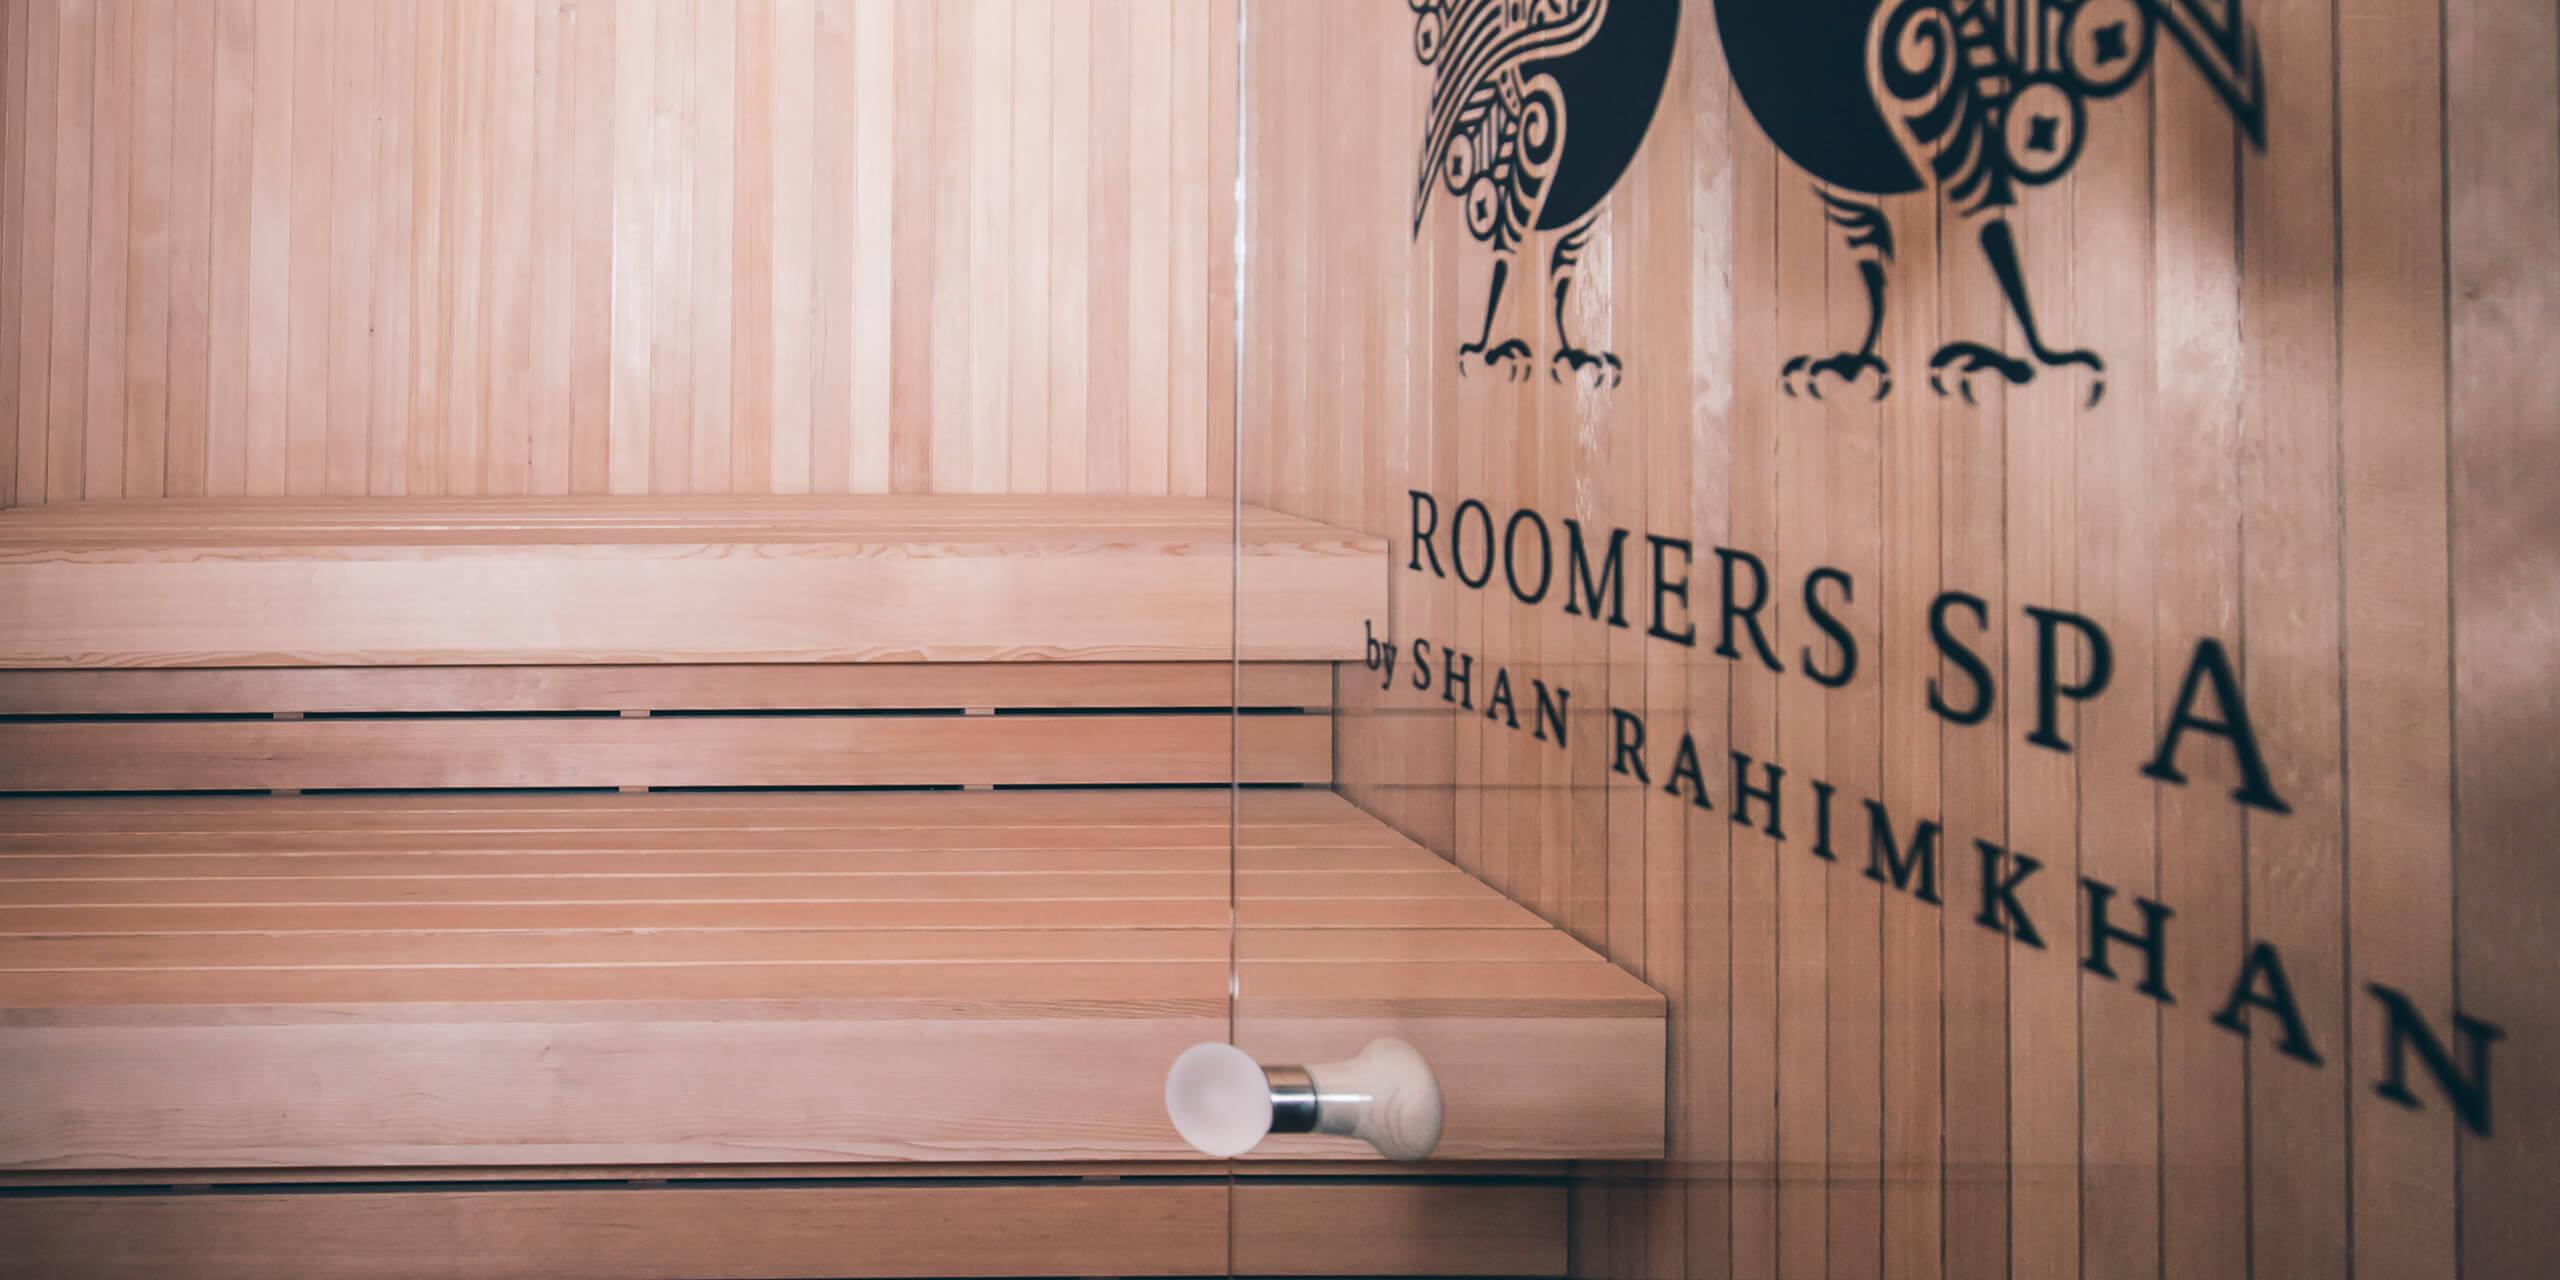 Roomers Munich Spa Shan Rahimkhan